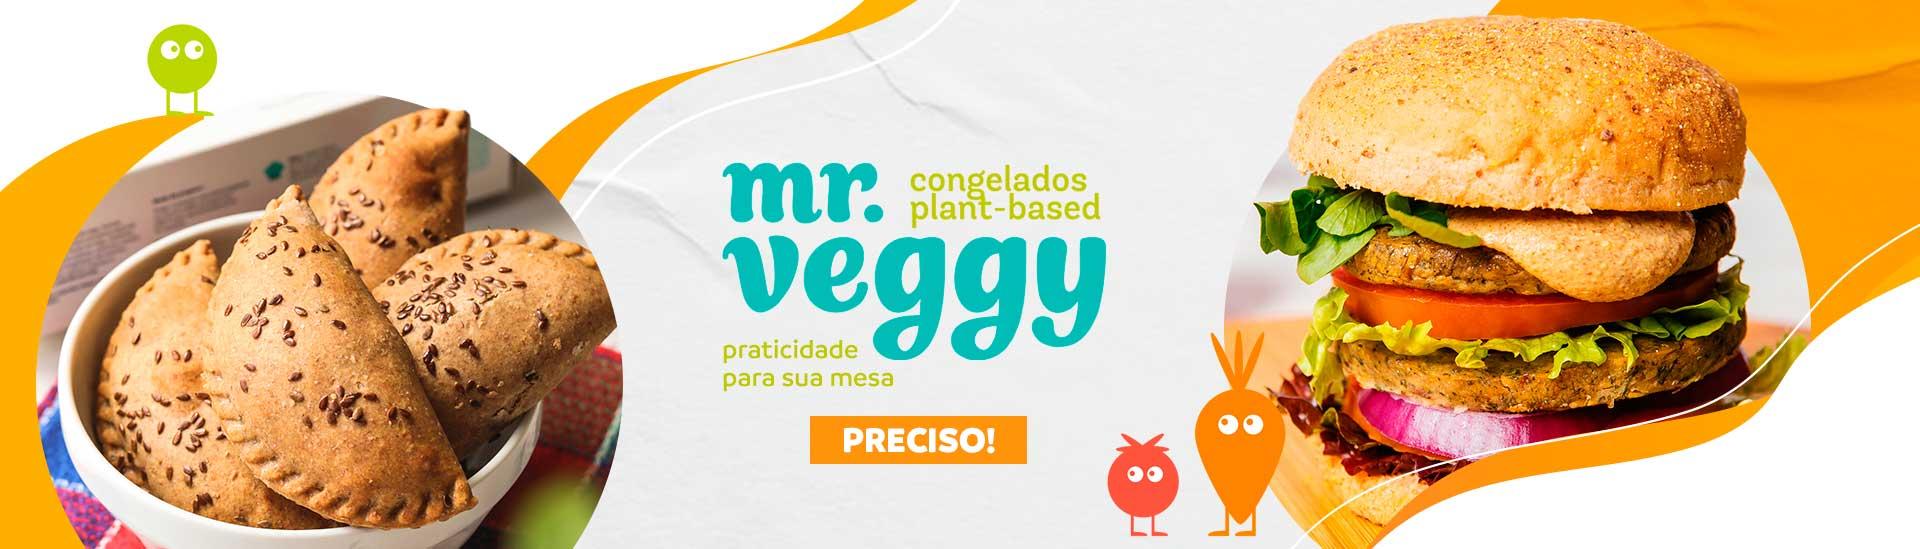 Veggy